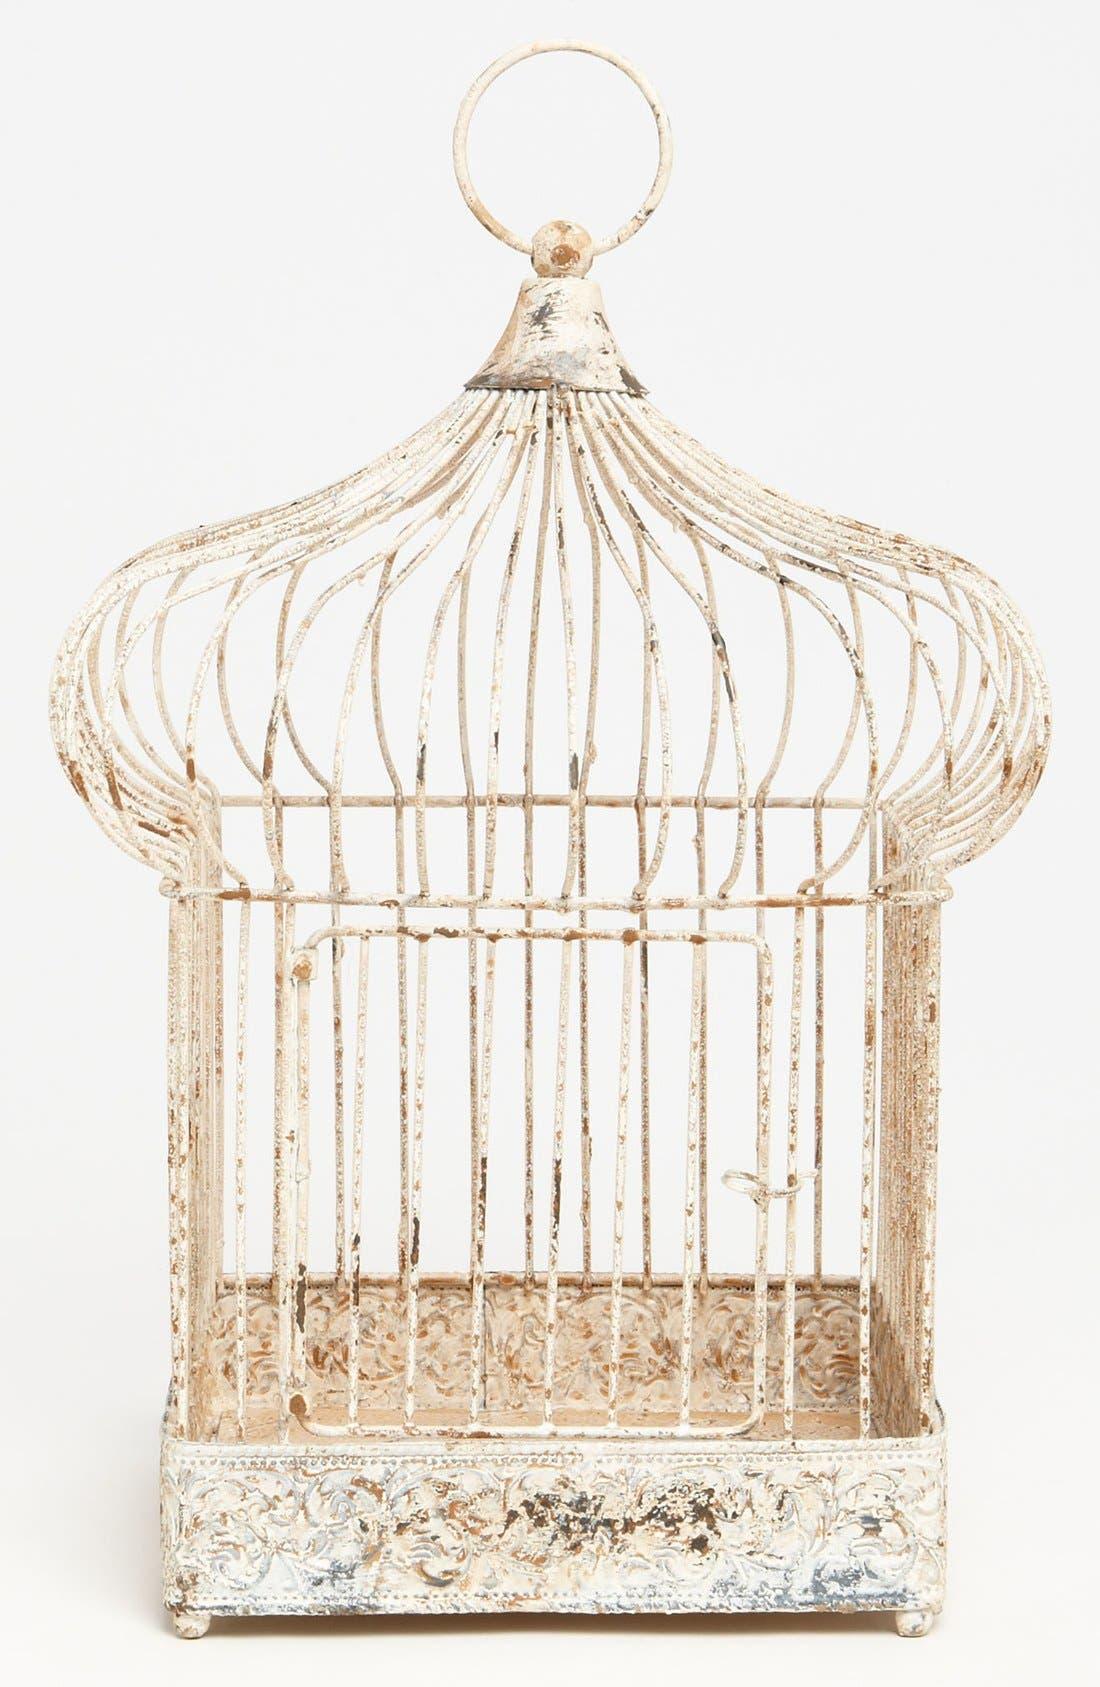 Alternate Image 1 Selected - Decorative Birdcage